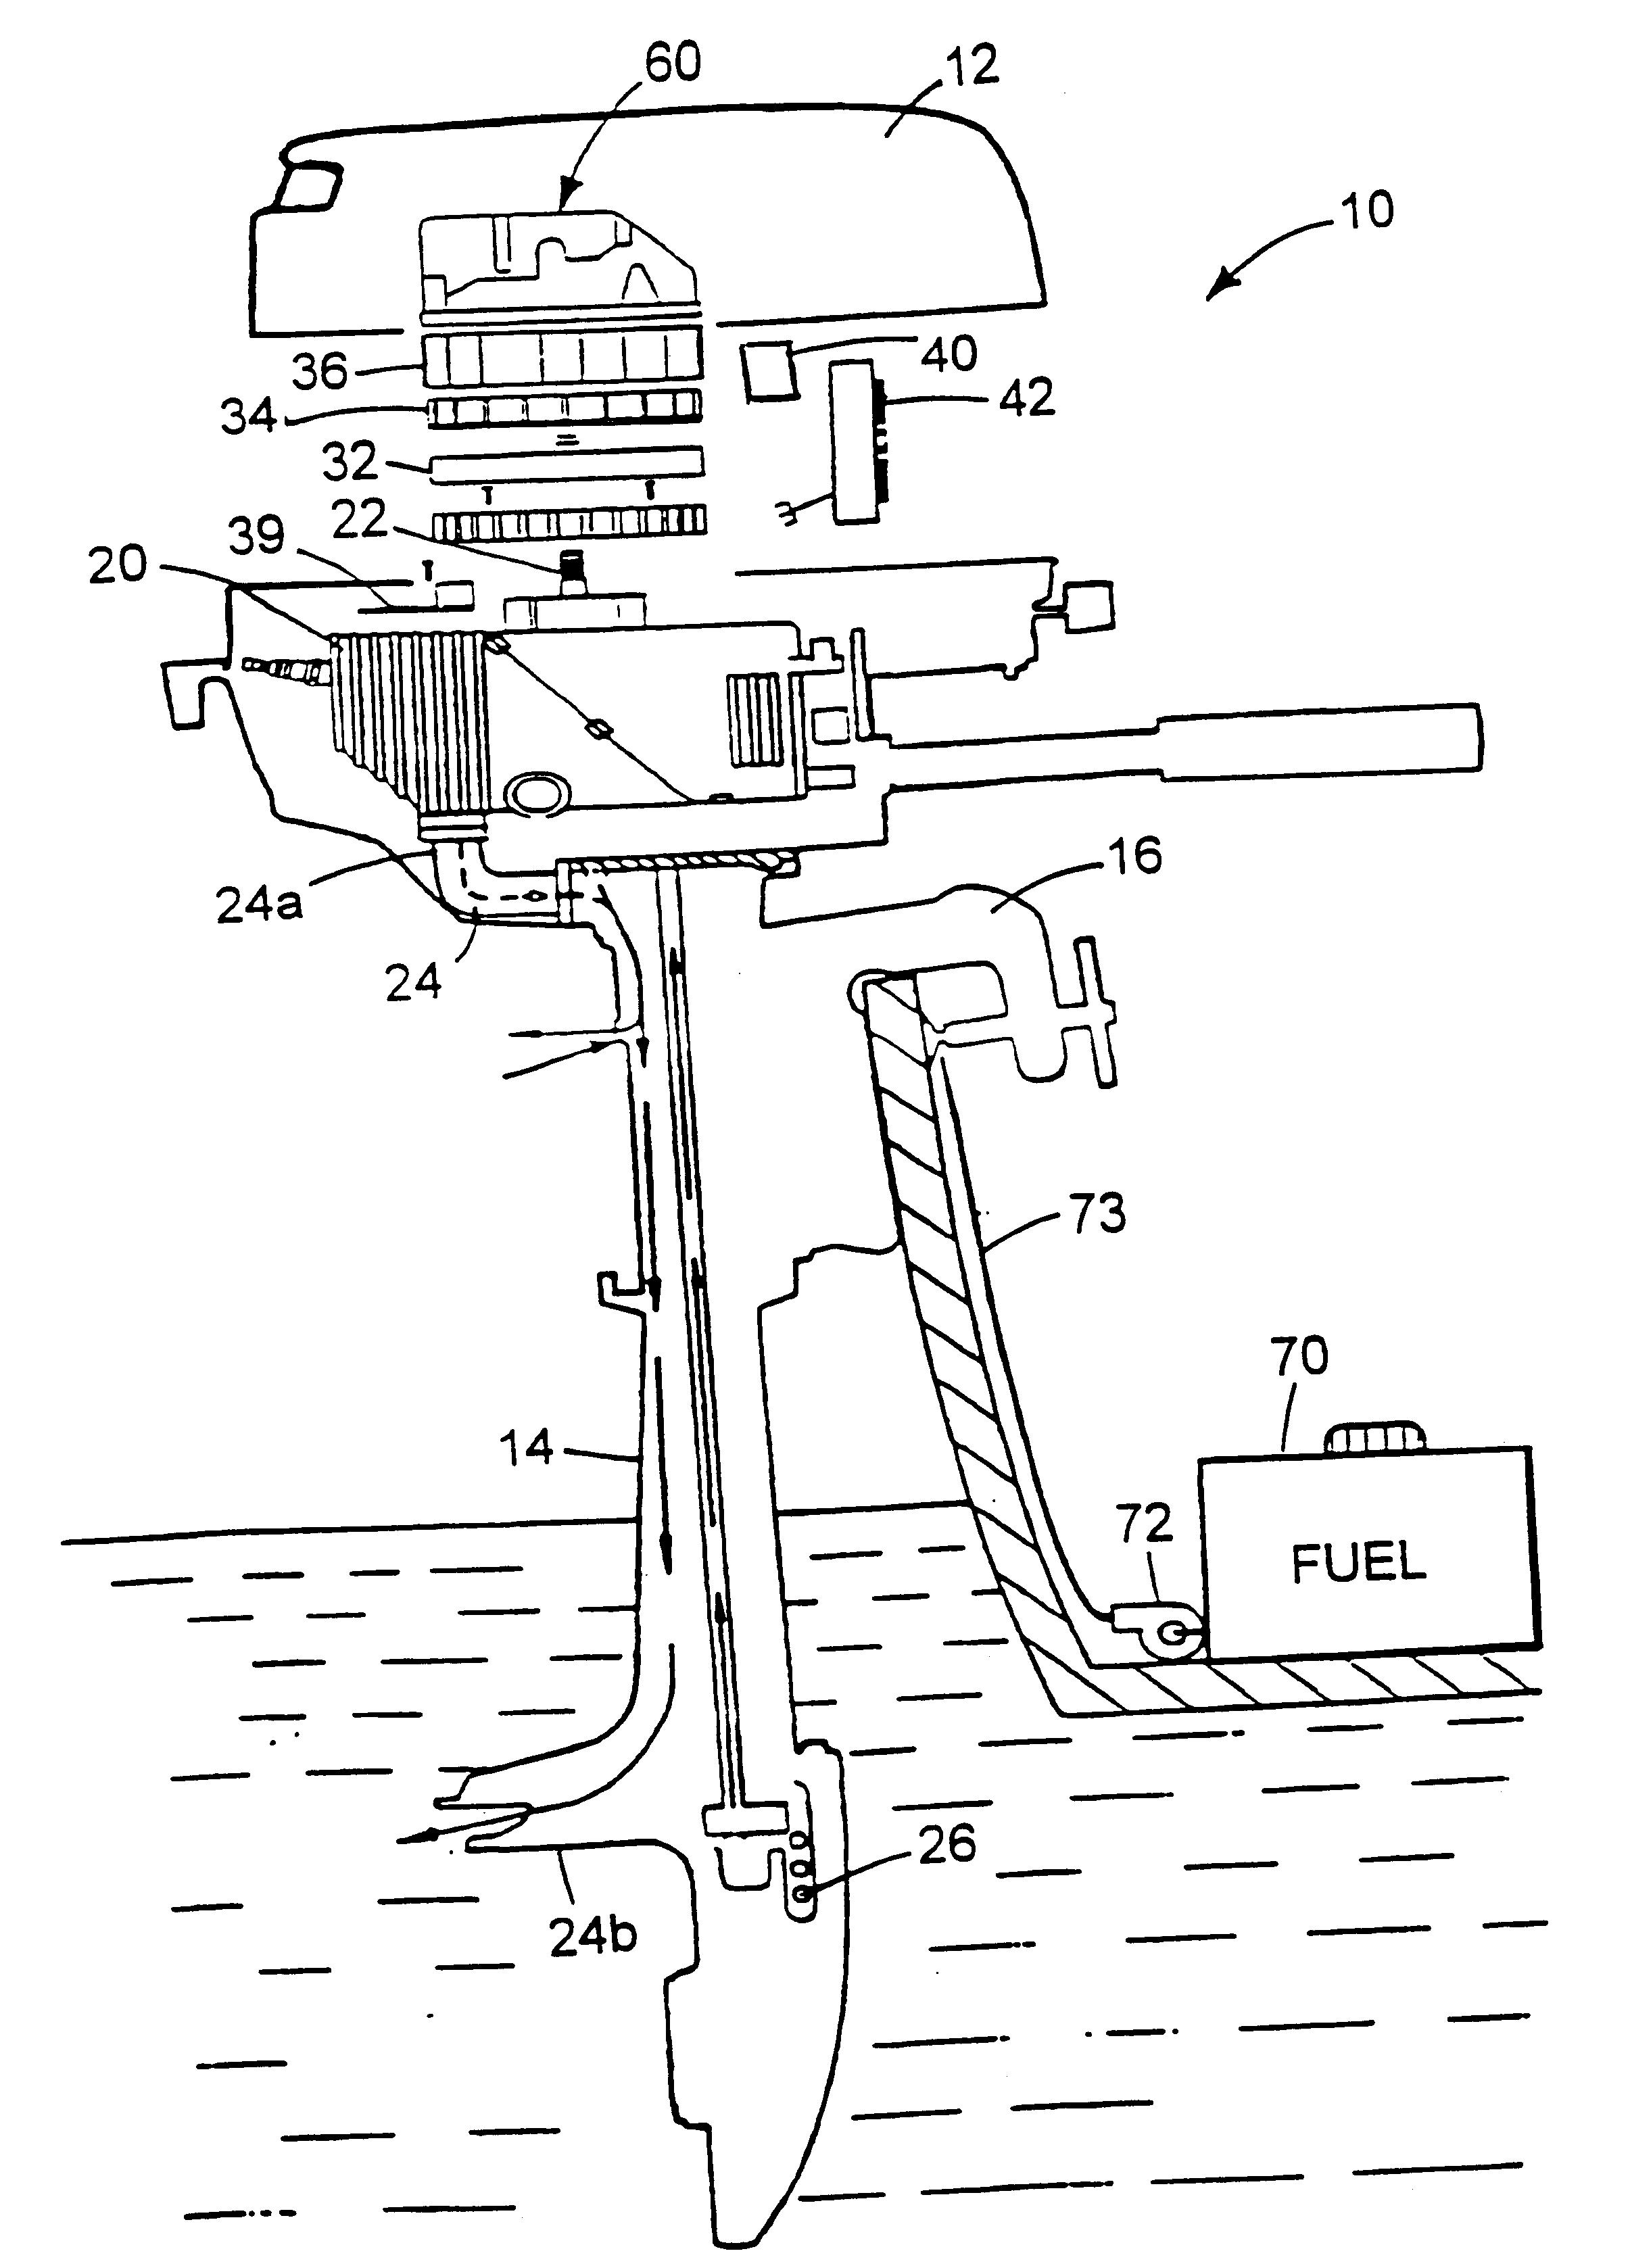 Westerbeke generator engine wiring diagrams clark